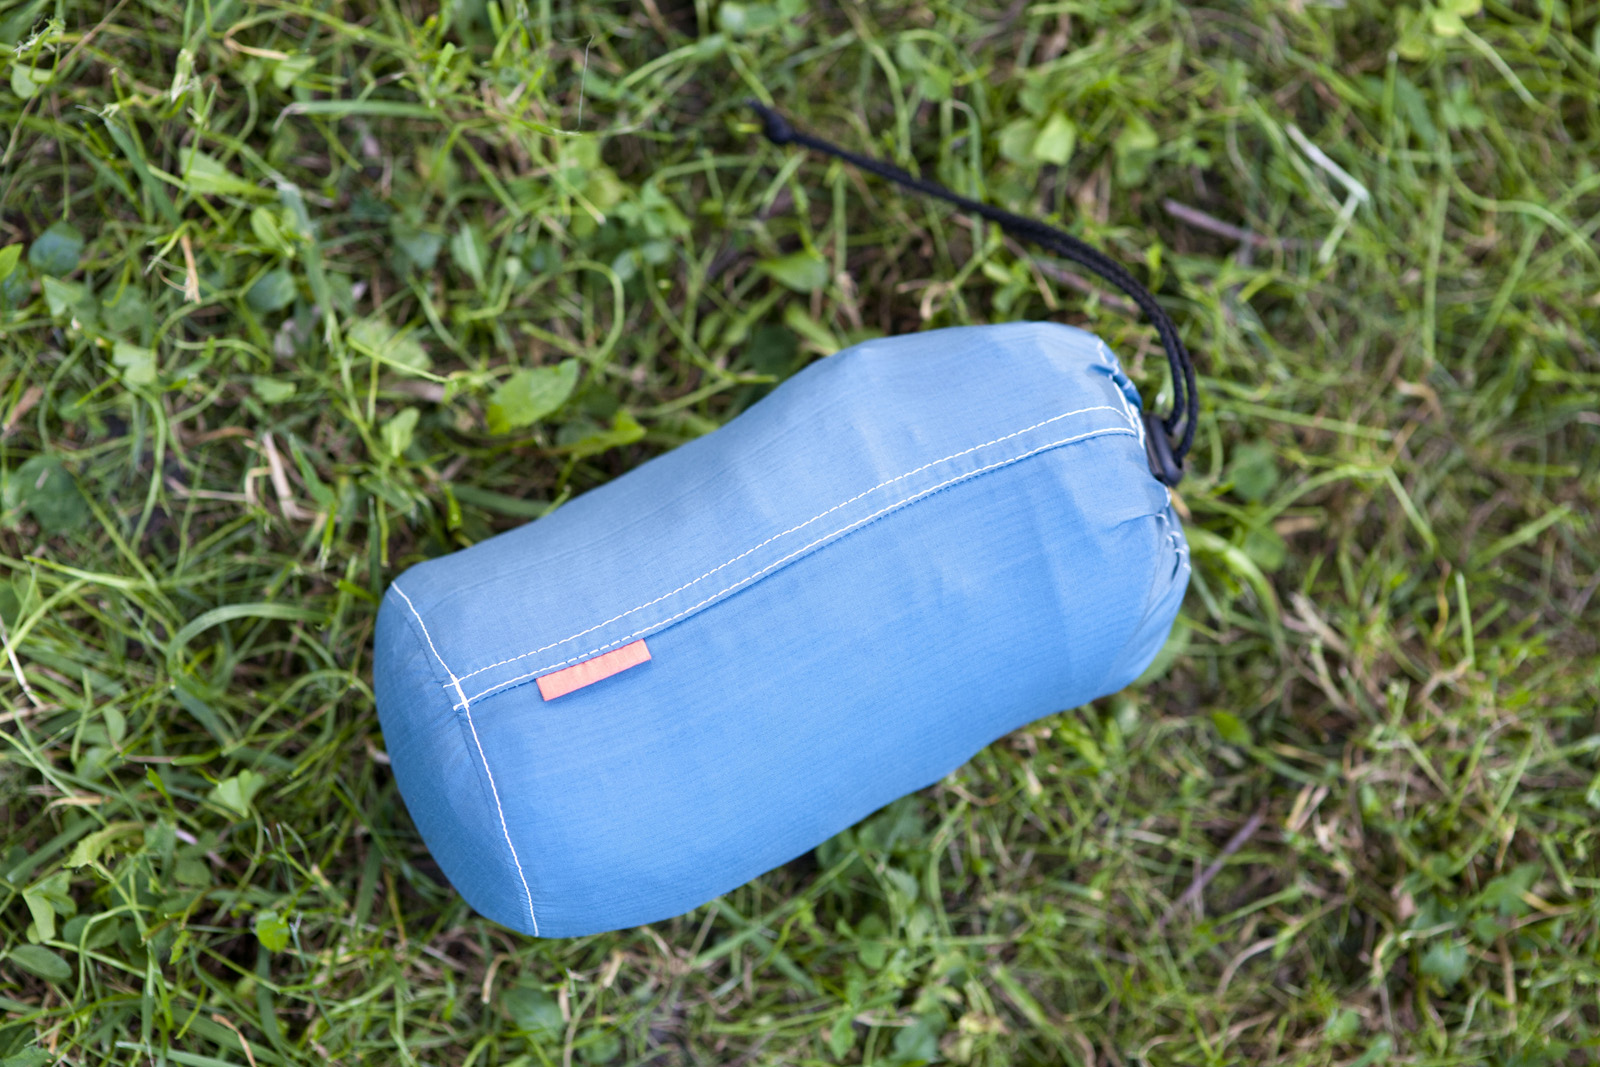 hamac ripstop blue-orange saculet 3